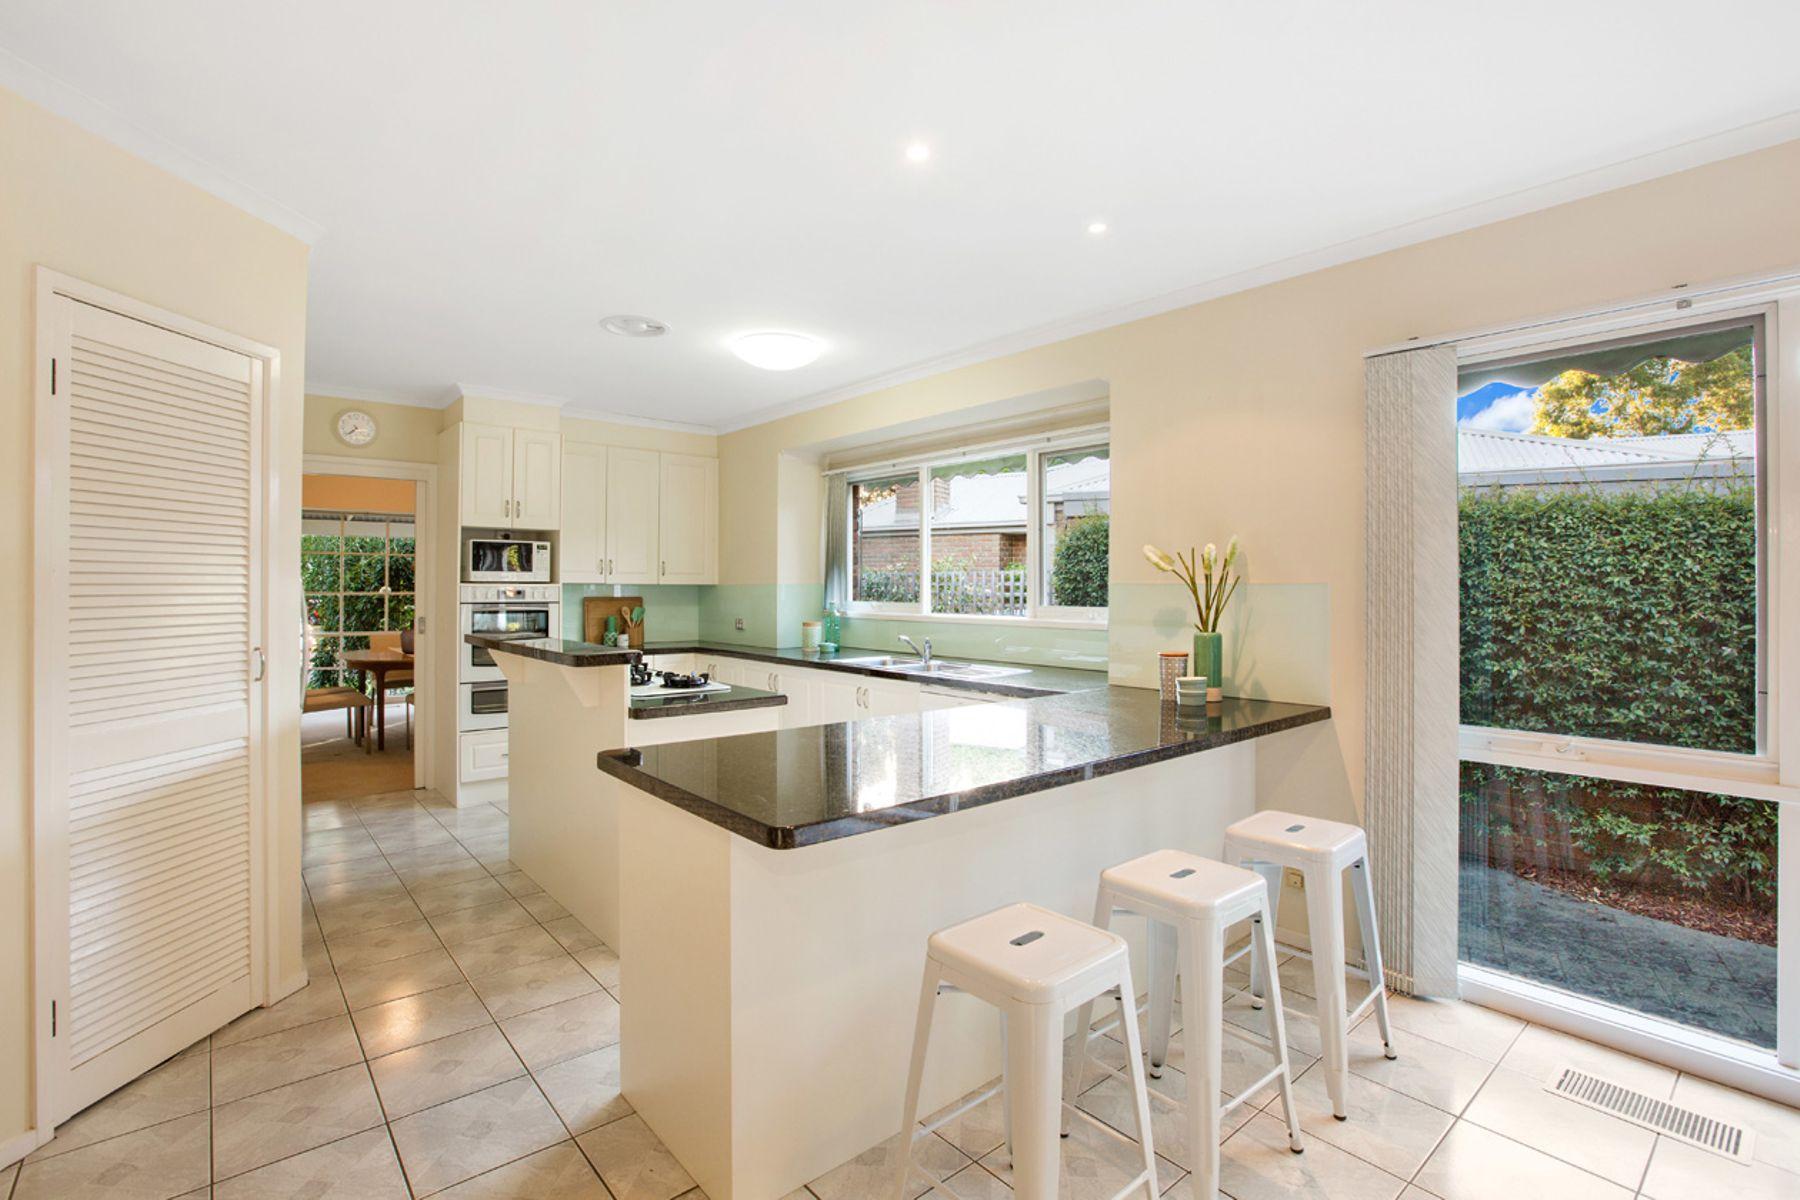 PhilipWebb Real Estate :: 11 St Andrews Close, Croydon, VIC 3136